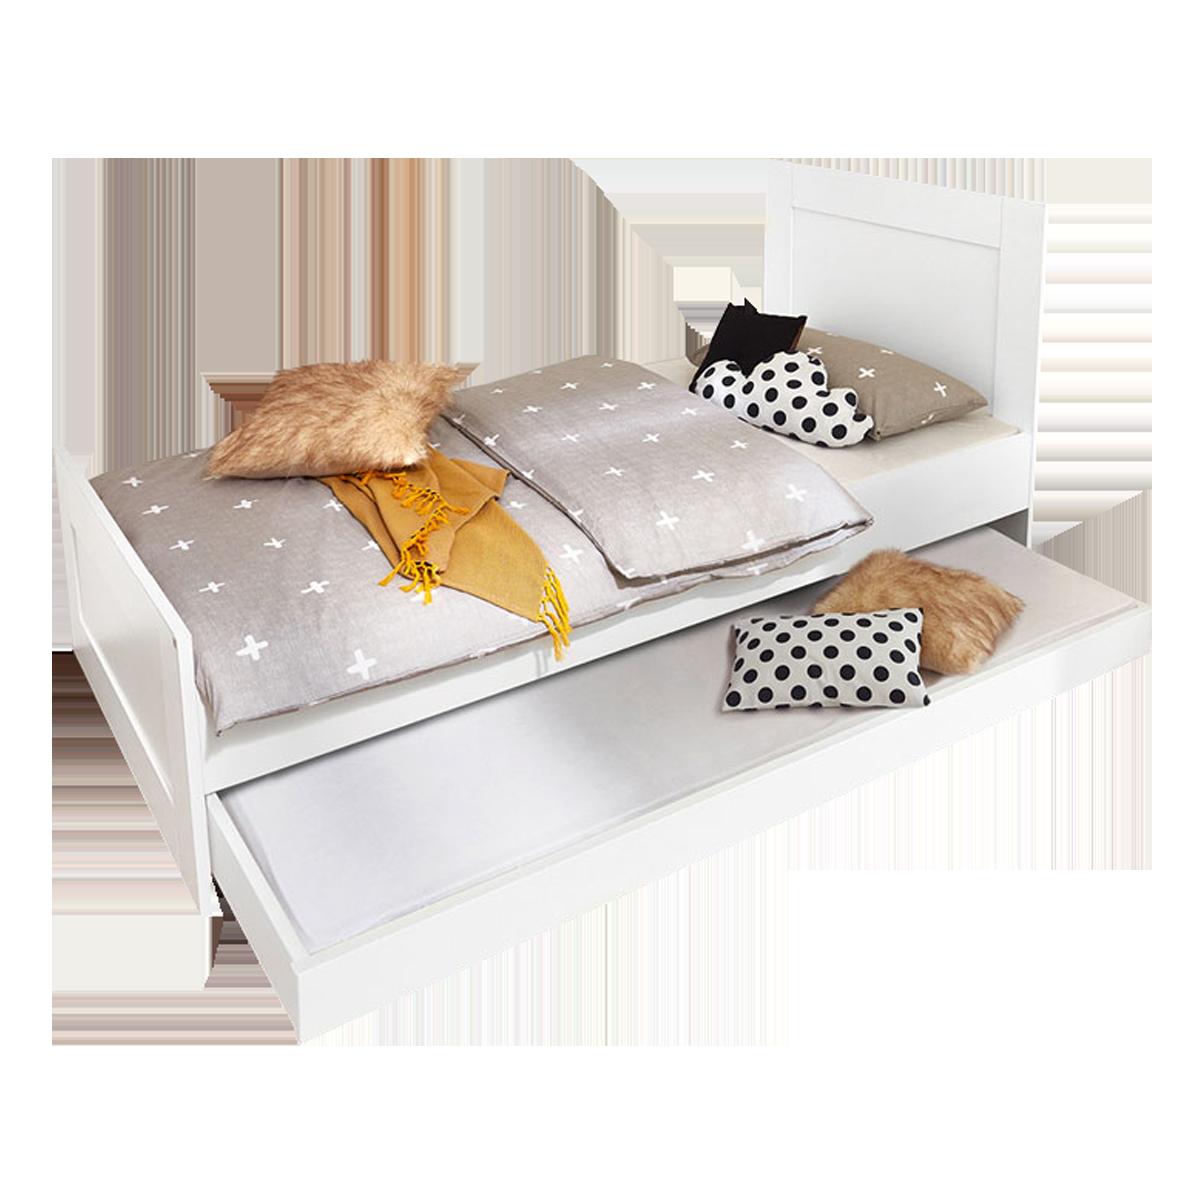 Full Size of Rhr Bush Kinderbett Wei Liegenbett Ausziehbar Jugendzimmer Bett Günstig Kaufen Massivholz Kiefer 90x200 Jugend Betten Designer Wickelbrett Für Ebay 180x200 Bett Bett Ausziehbar